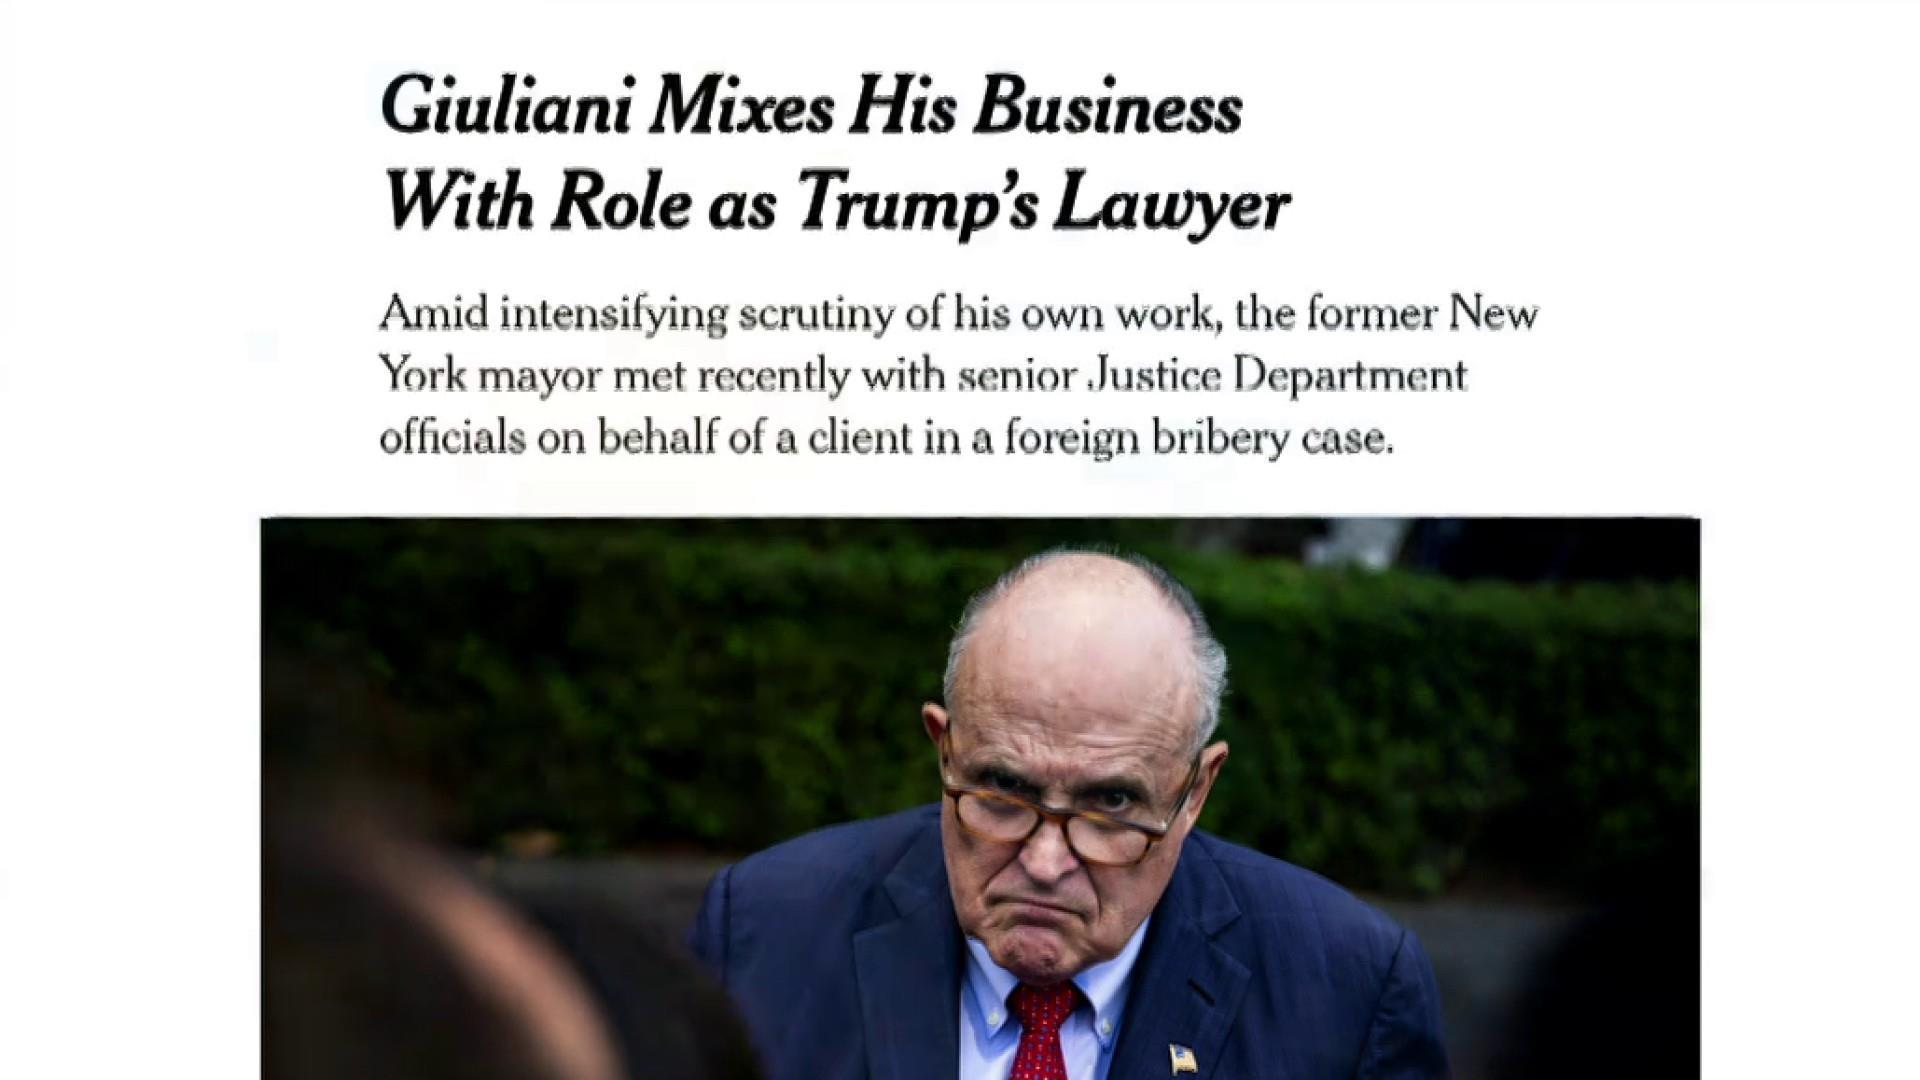 Giuliani lobbying Trump admin on behalf of foreign client: NYT